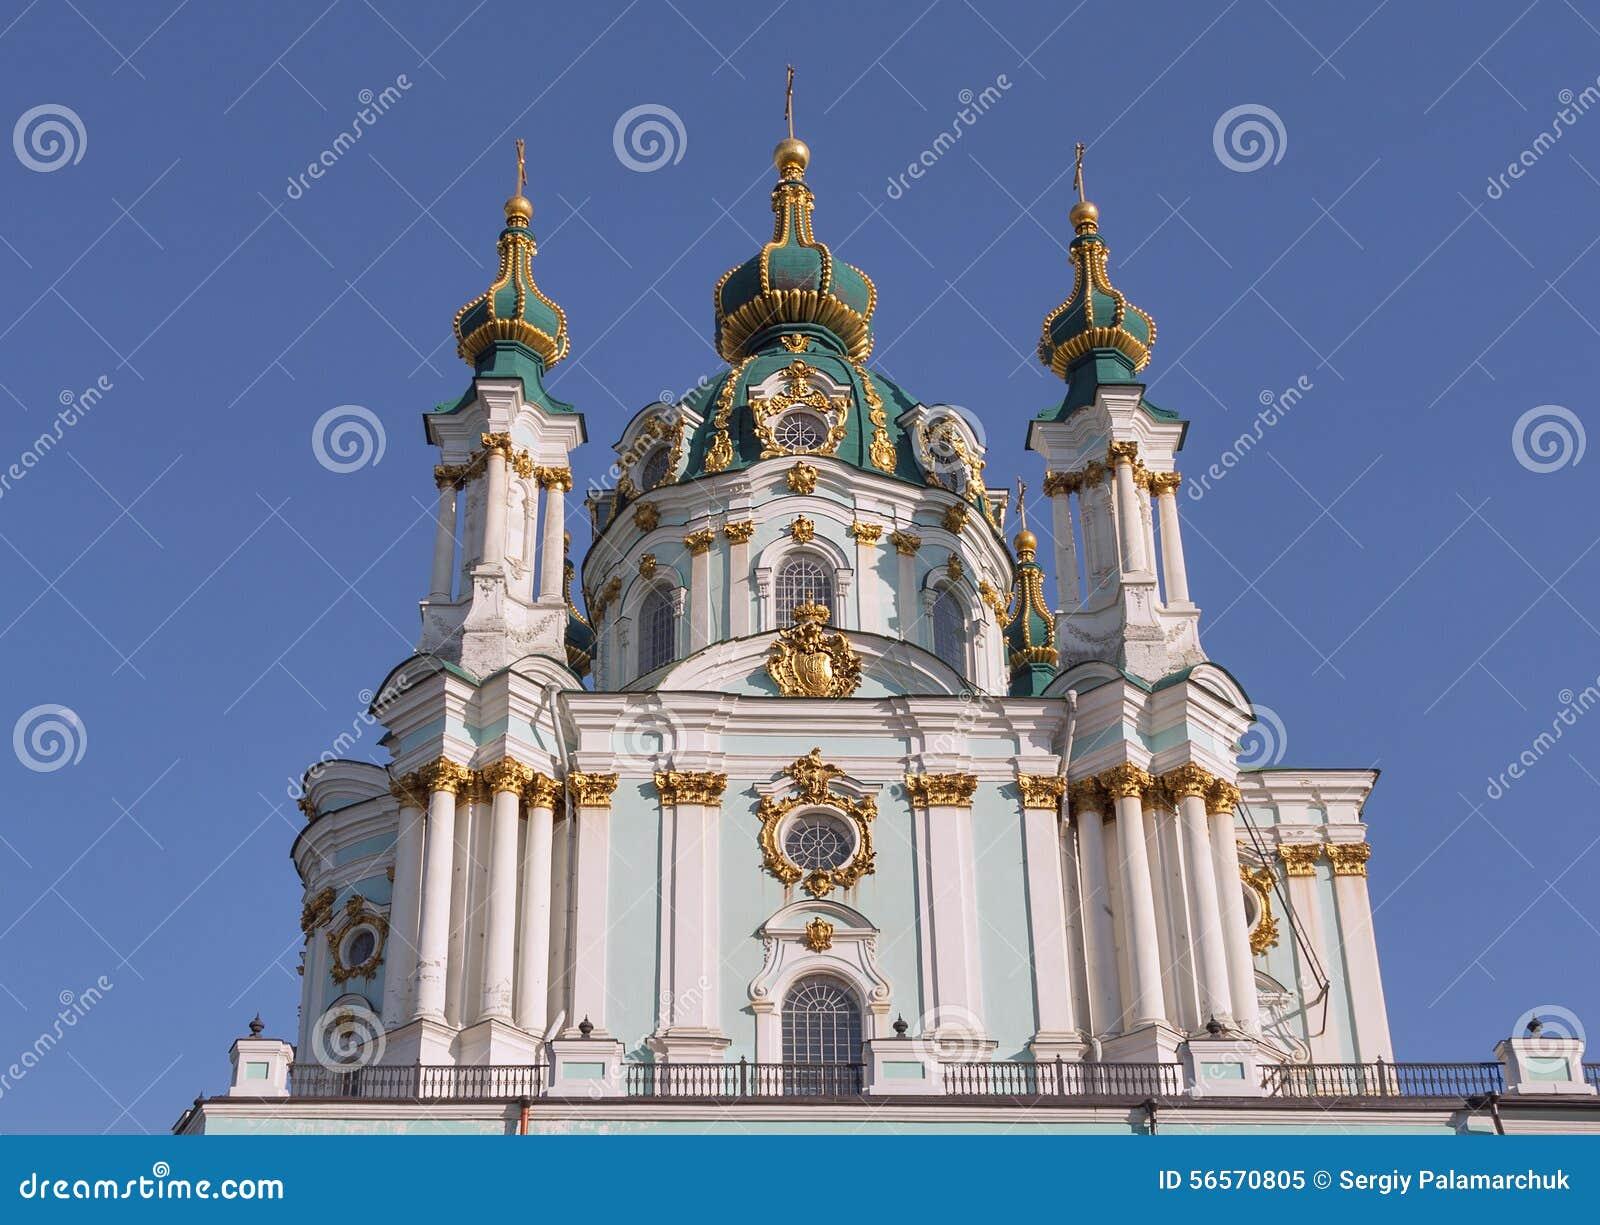 Download Μπαρόκ εκκλησία του ST Andrew στο Κίεβο, Ουκρανία Στοκ Εικόνα - εικόνα από καθαρίστε, θρησκευτικός: 56570805